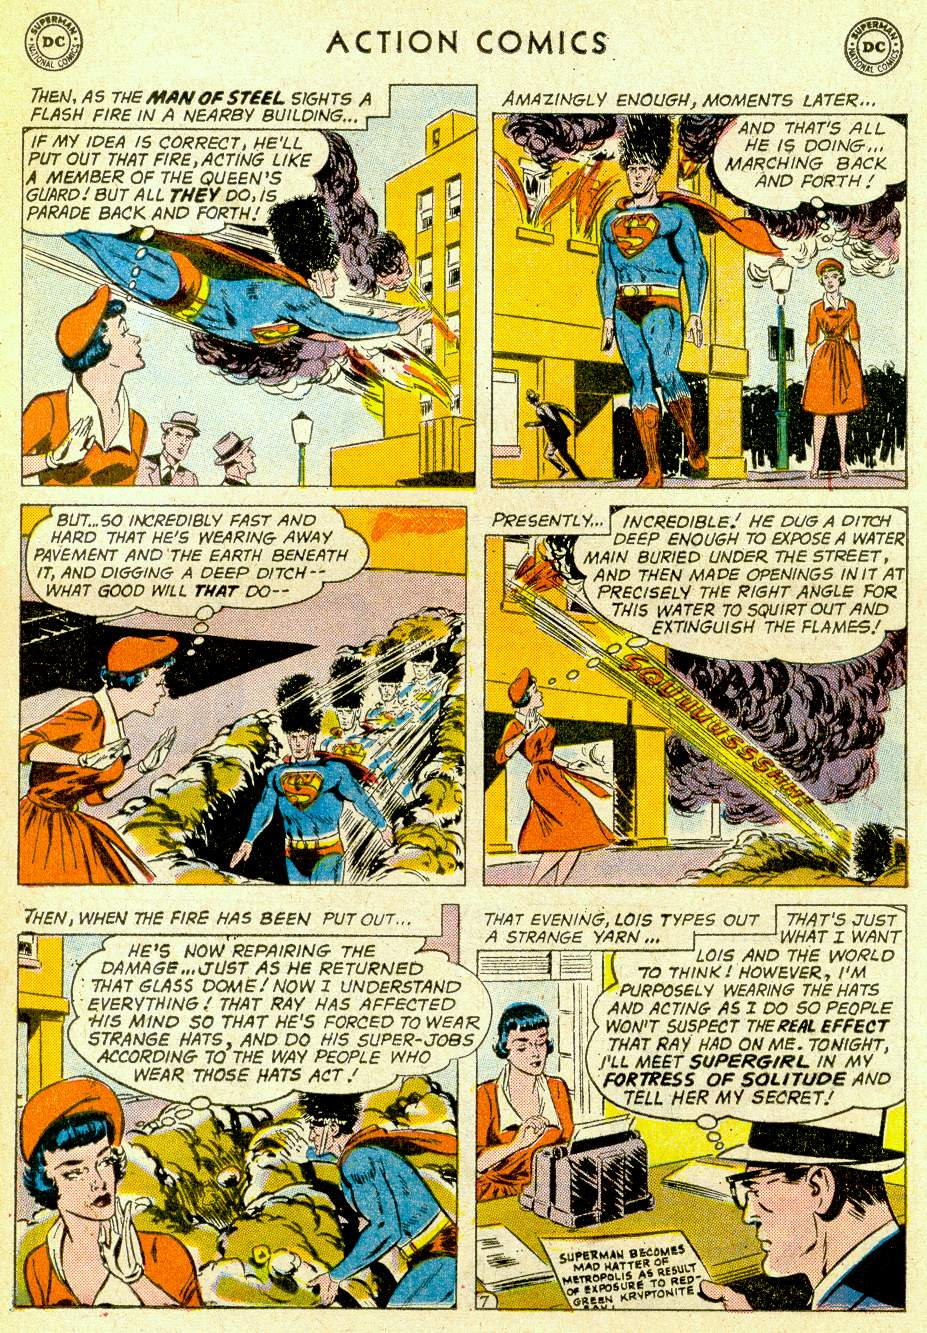 Action Comics (1938) 275 Page 8